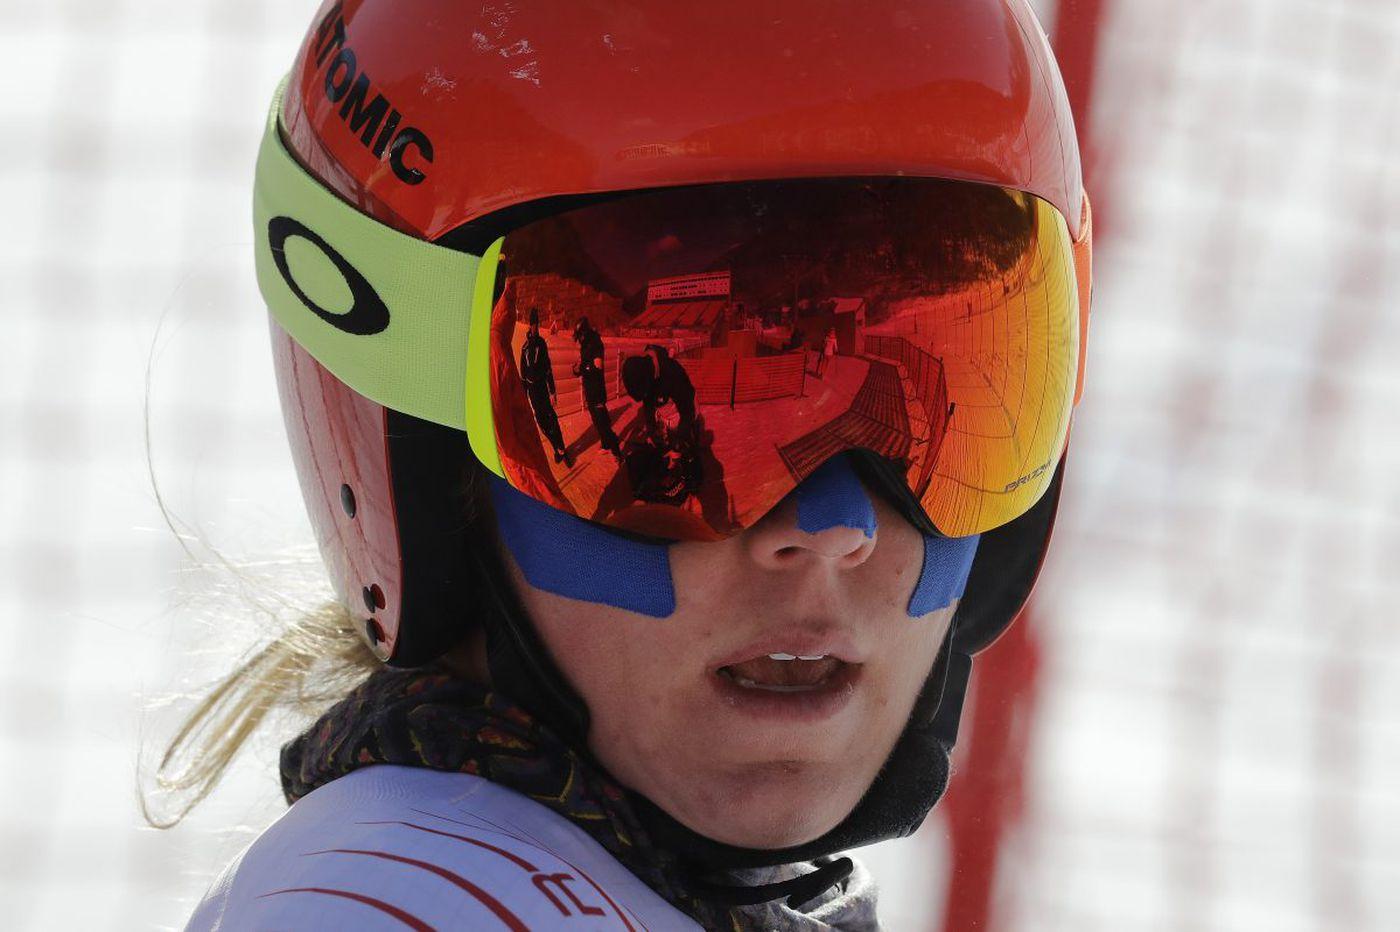 Tuesday's Olympic Watch: Mikaela Shiffrin, Shaun White in spotlight